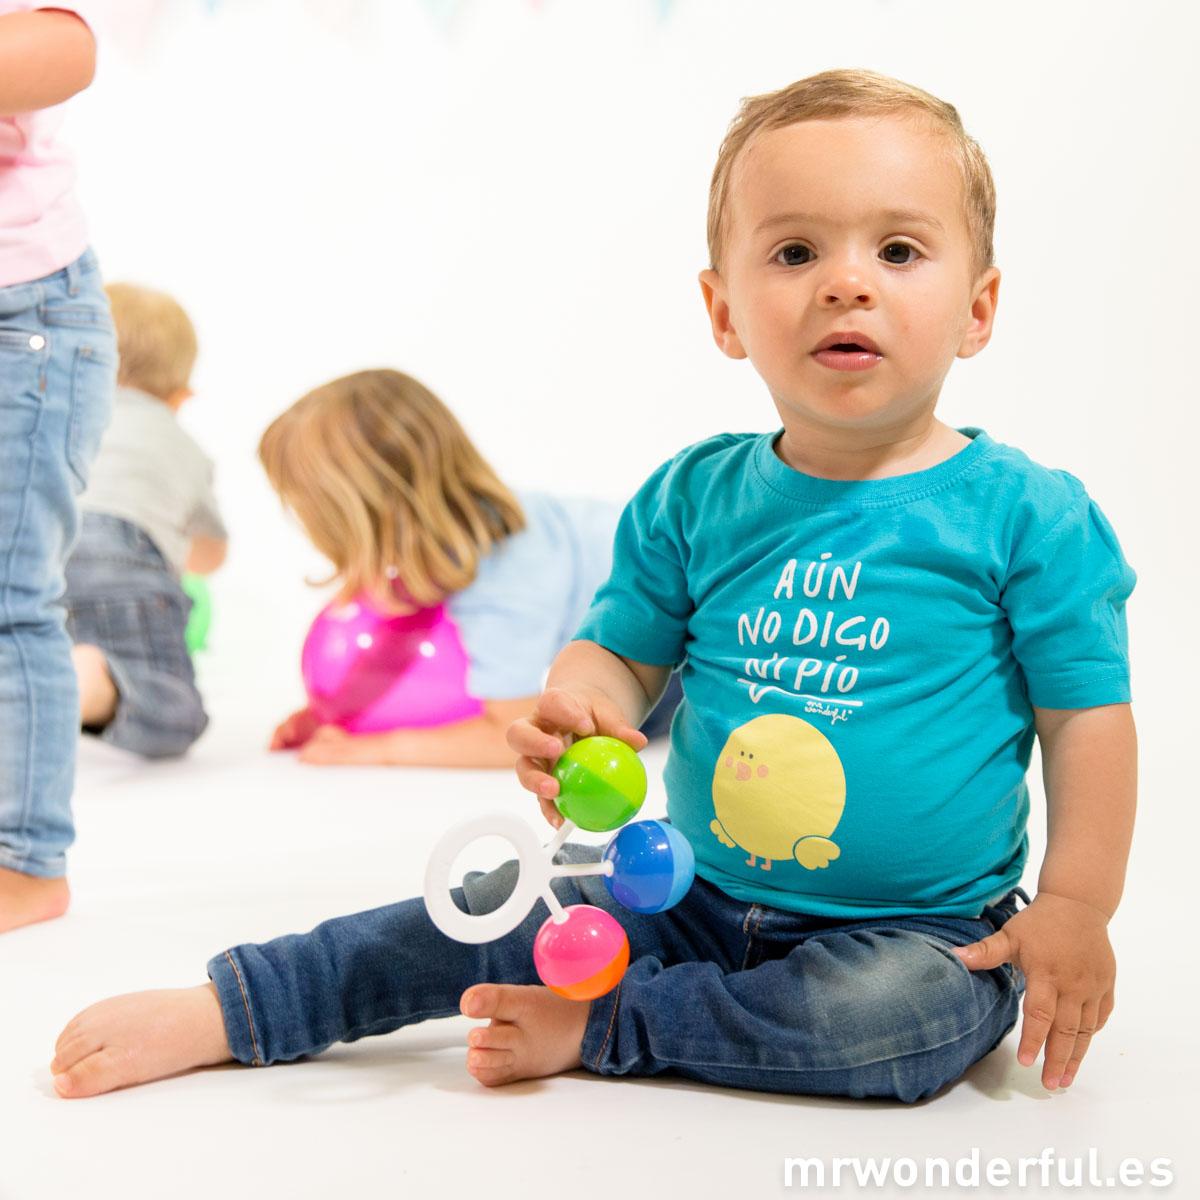 mrwonderful_8436547191000_CAMIS_001_Camiseta-nino-Aun-no-digo-ni-pio-4-4